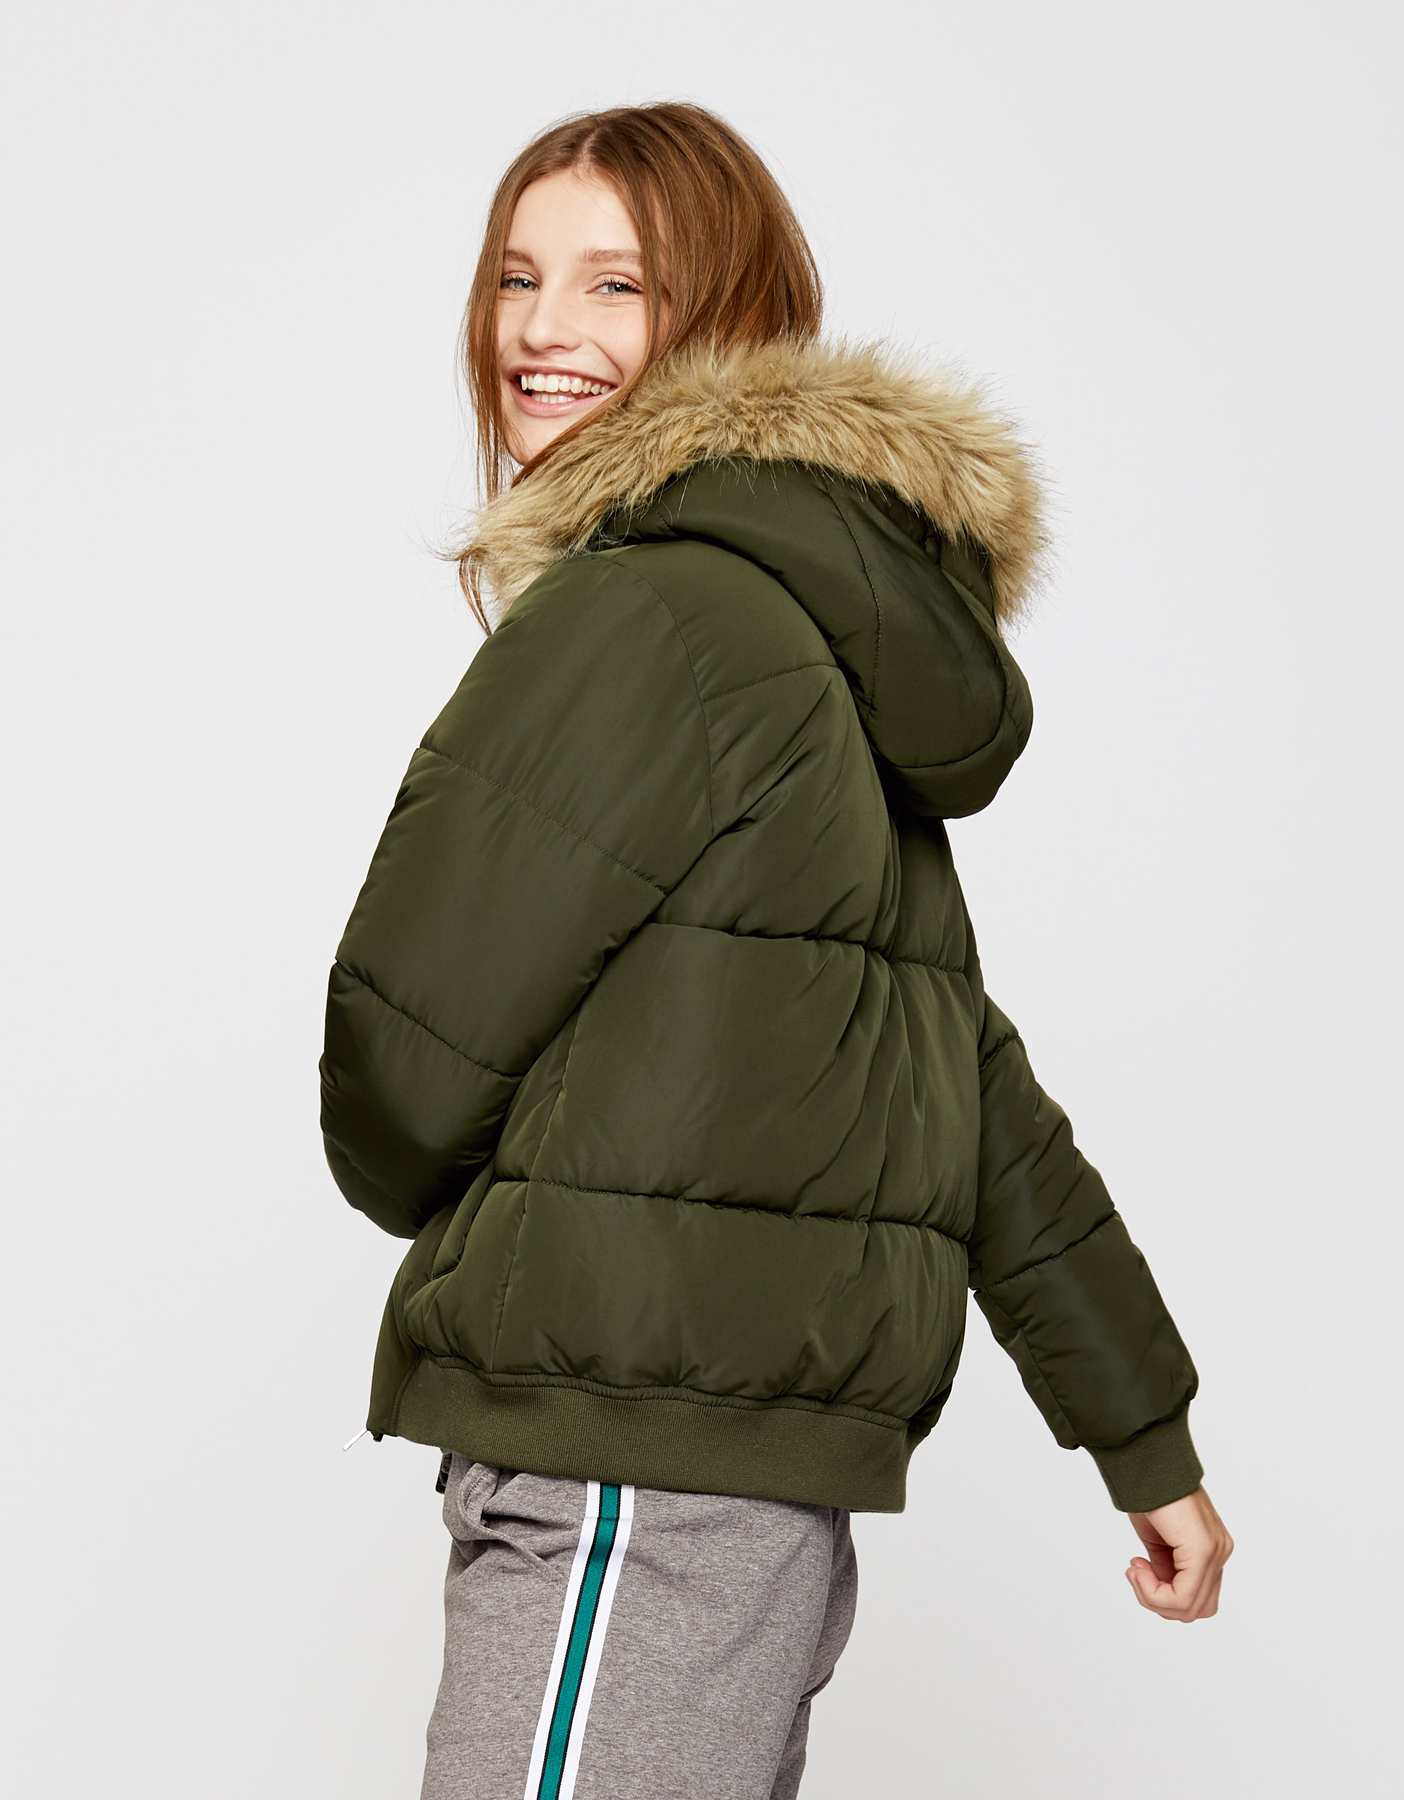 Khaki Puffer Jacket with Hood